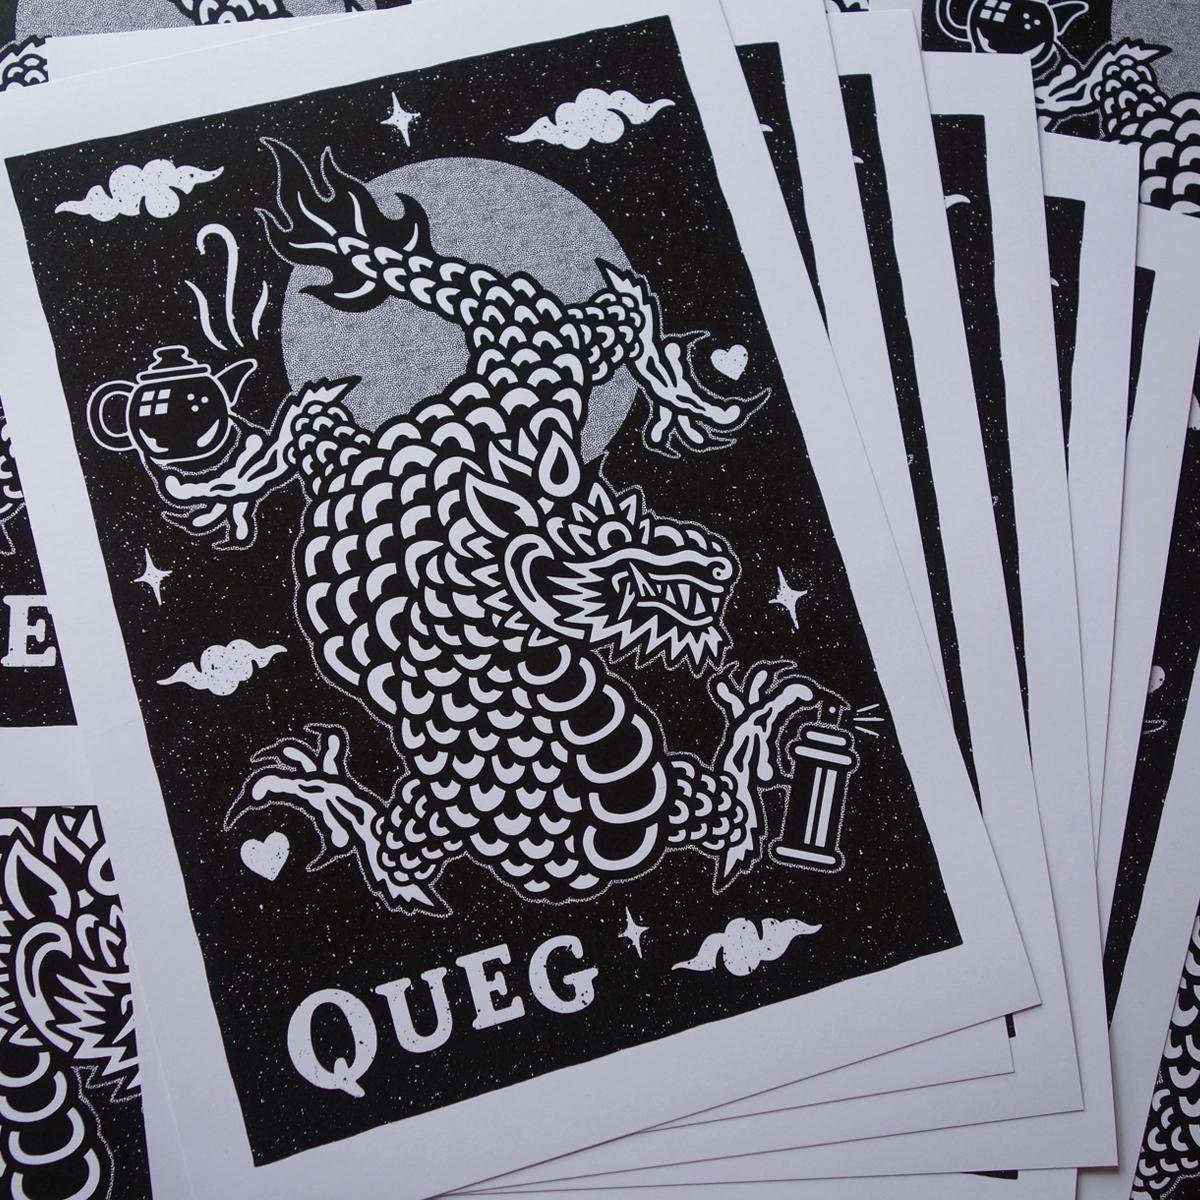 Kev Grey 'Queg Print'